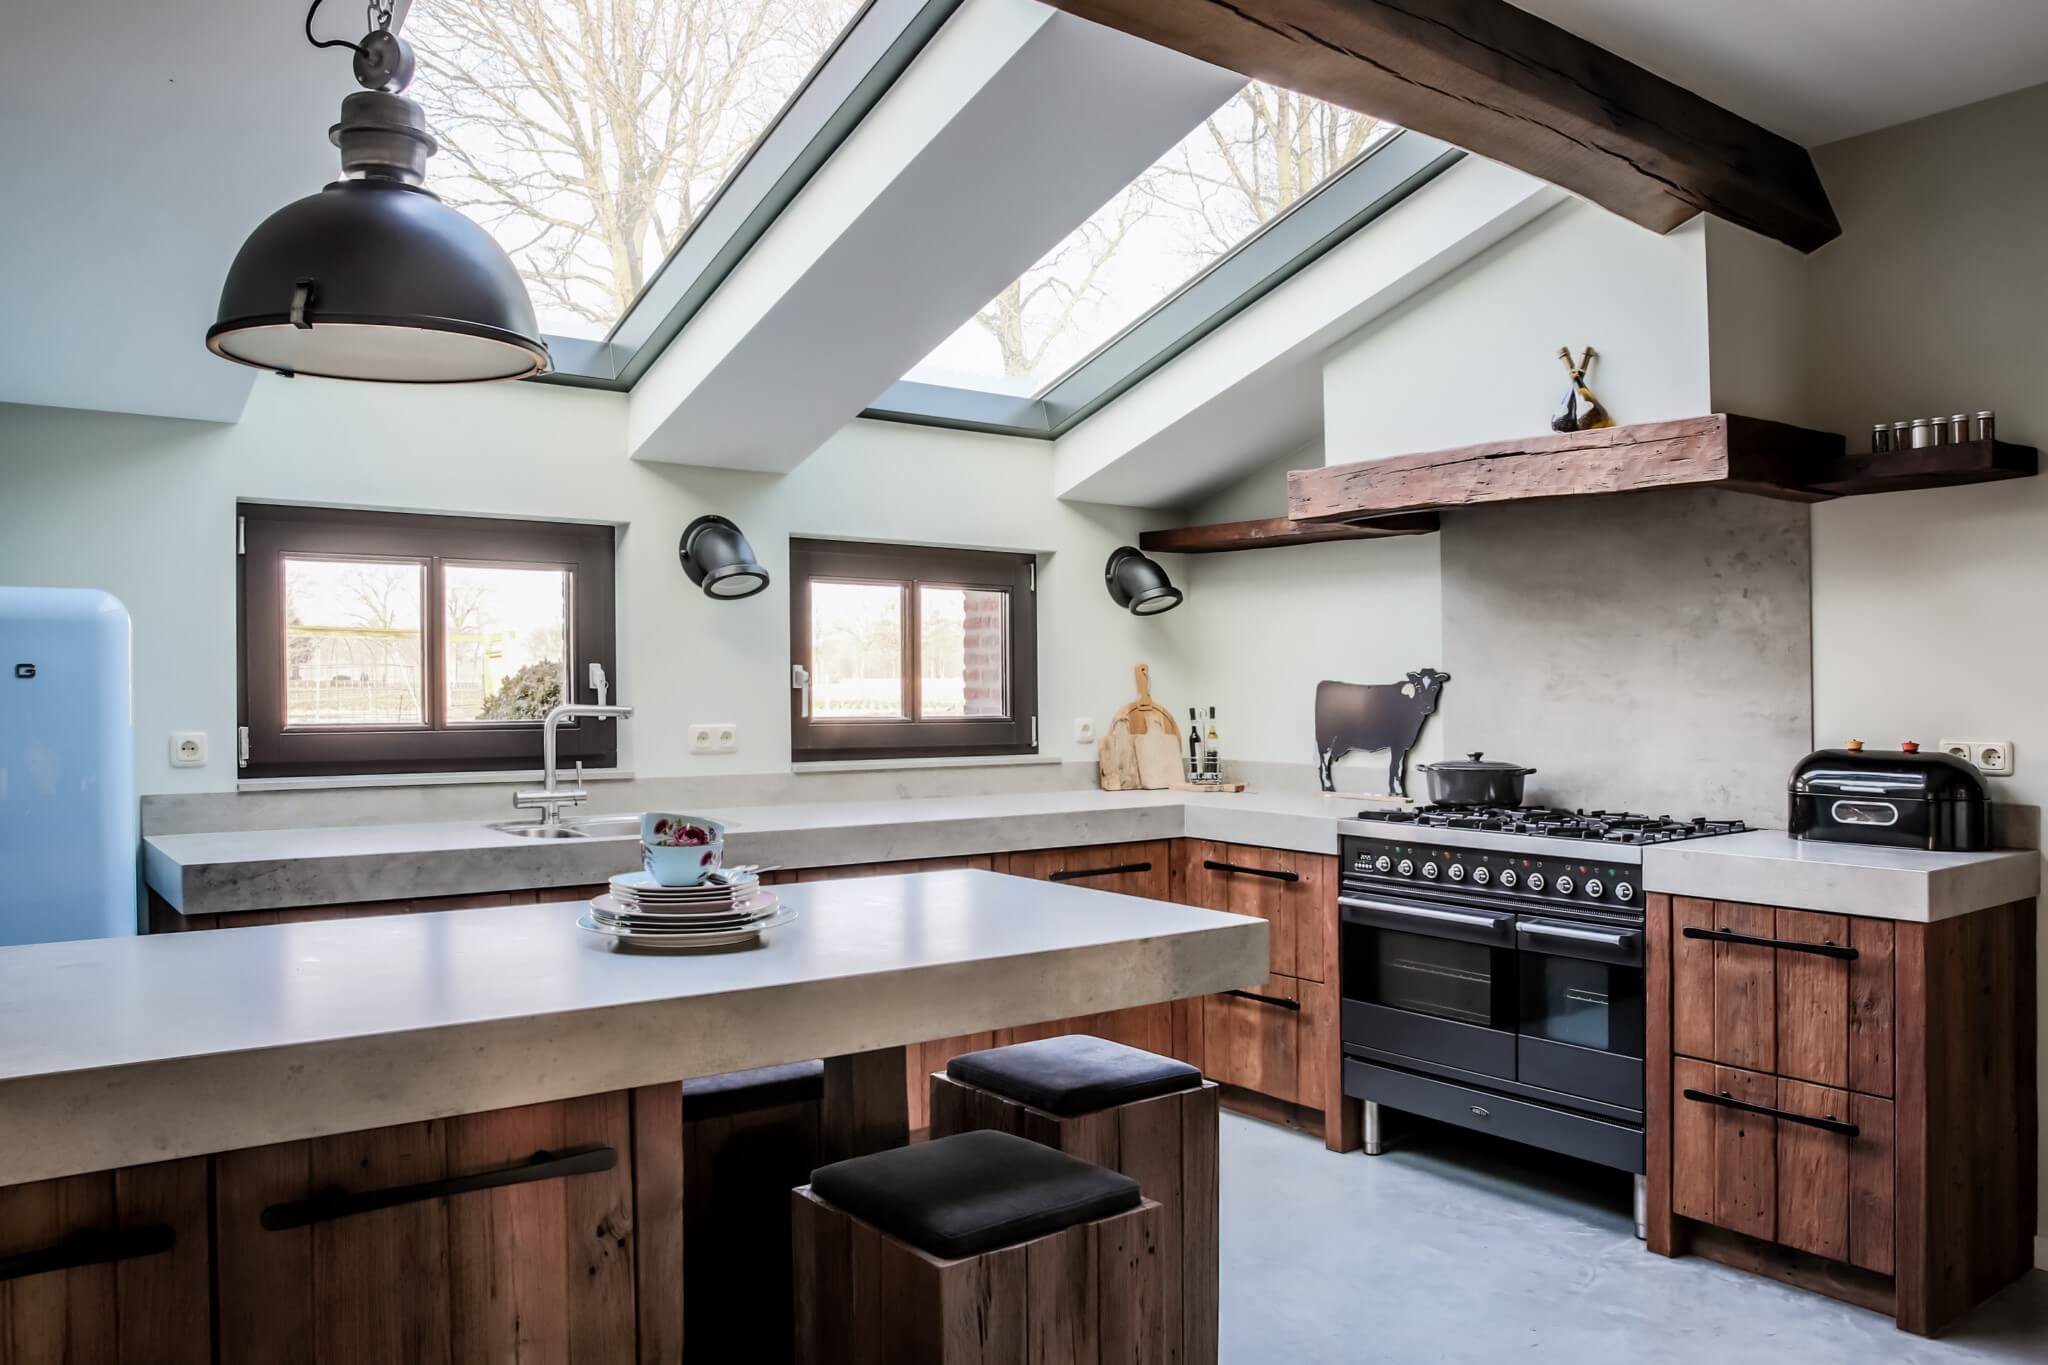 Houten keukenblok